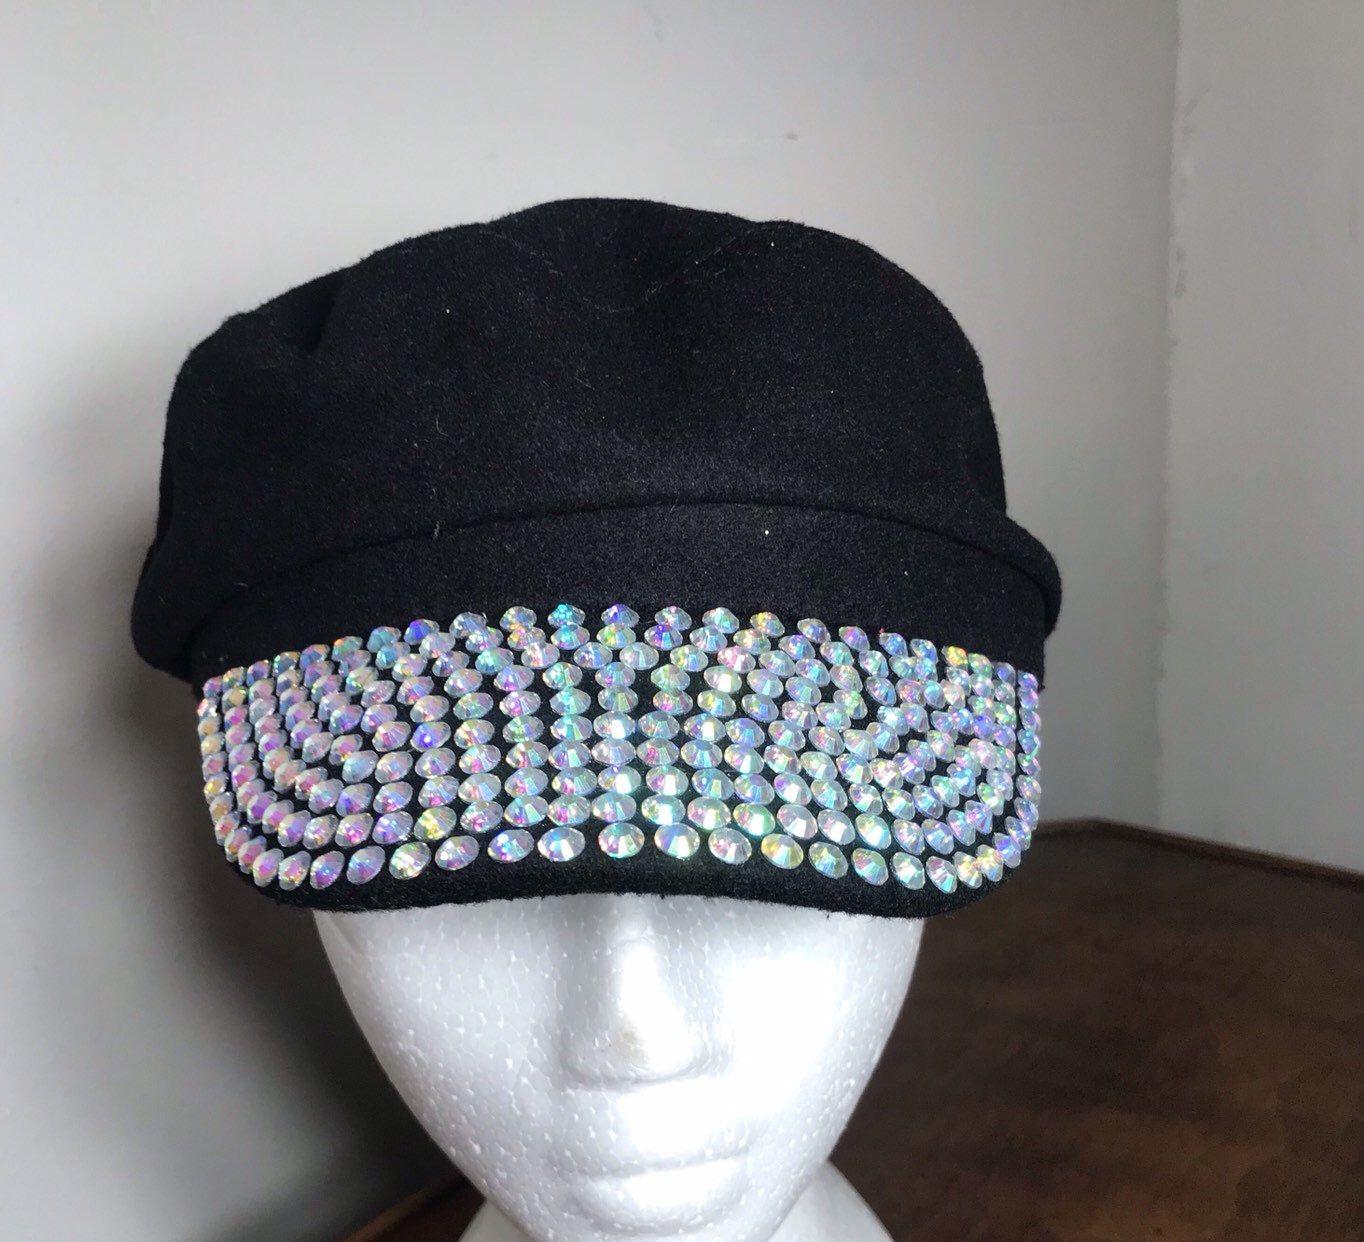 Black wool blend cap hat with clear resin rhinestone